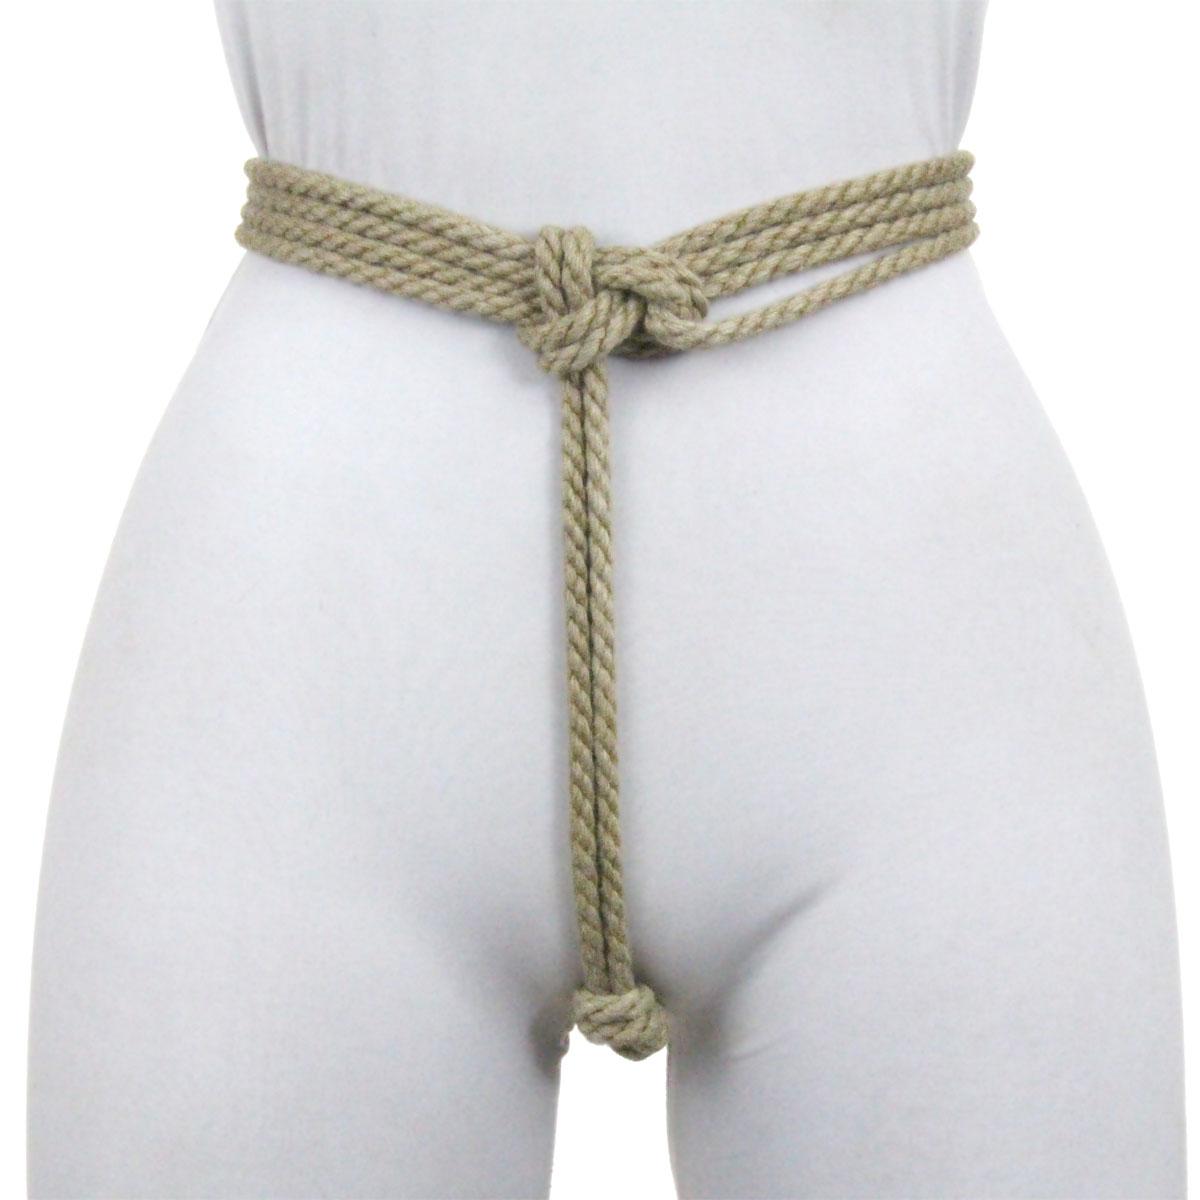 Unchastity-Belt